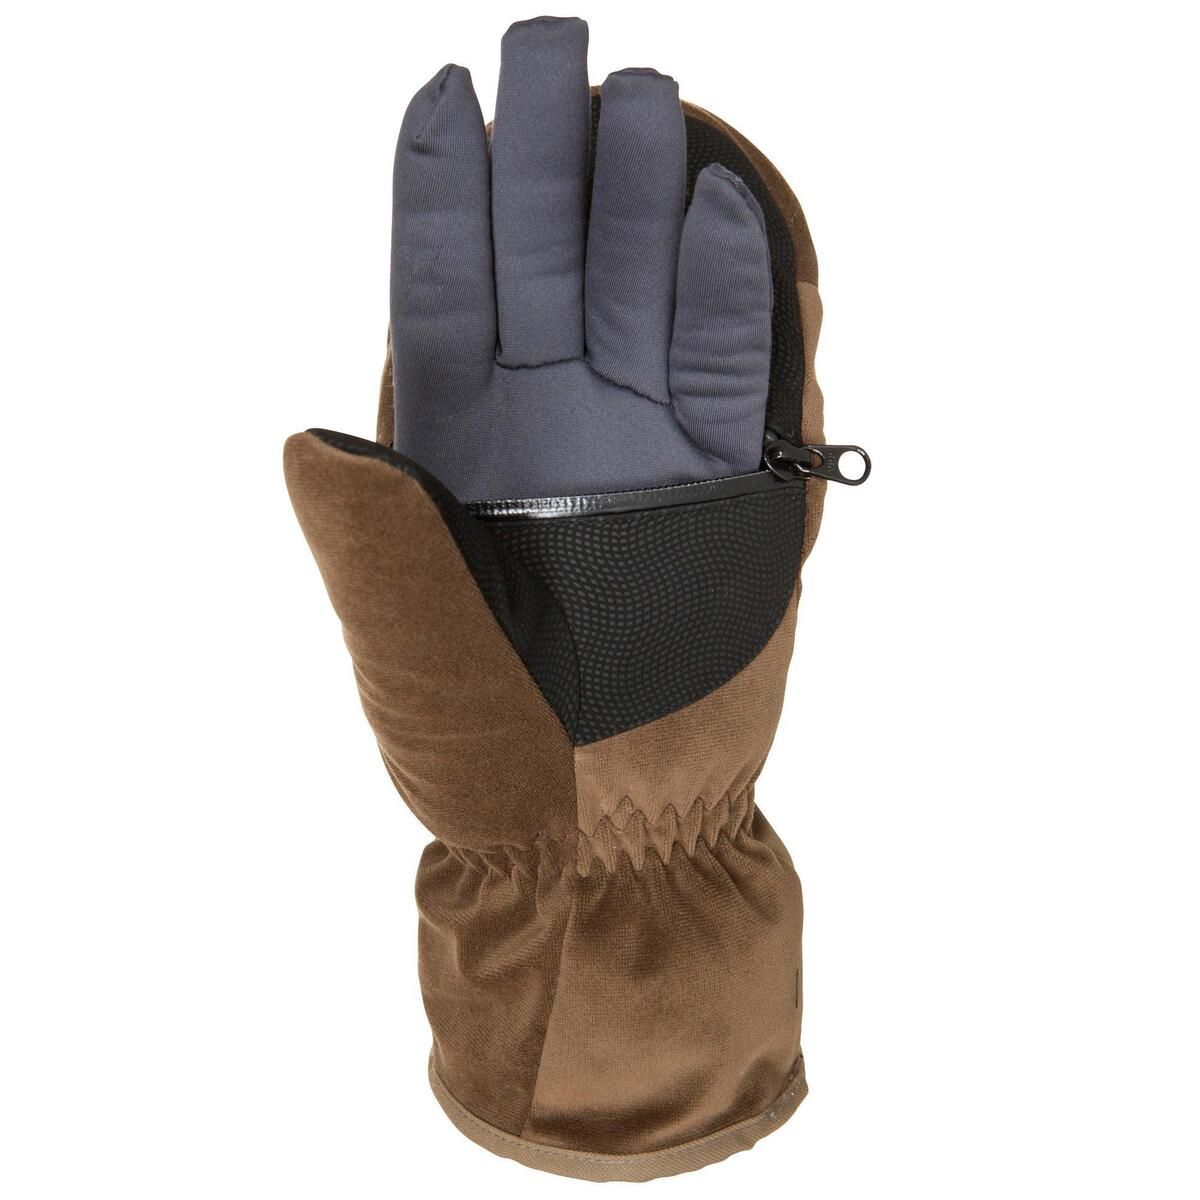 Bild 3 von Jagd-Handschuhe Toundra 500 braun